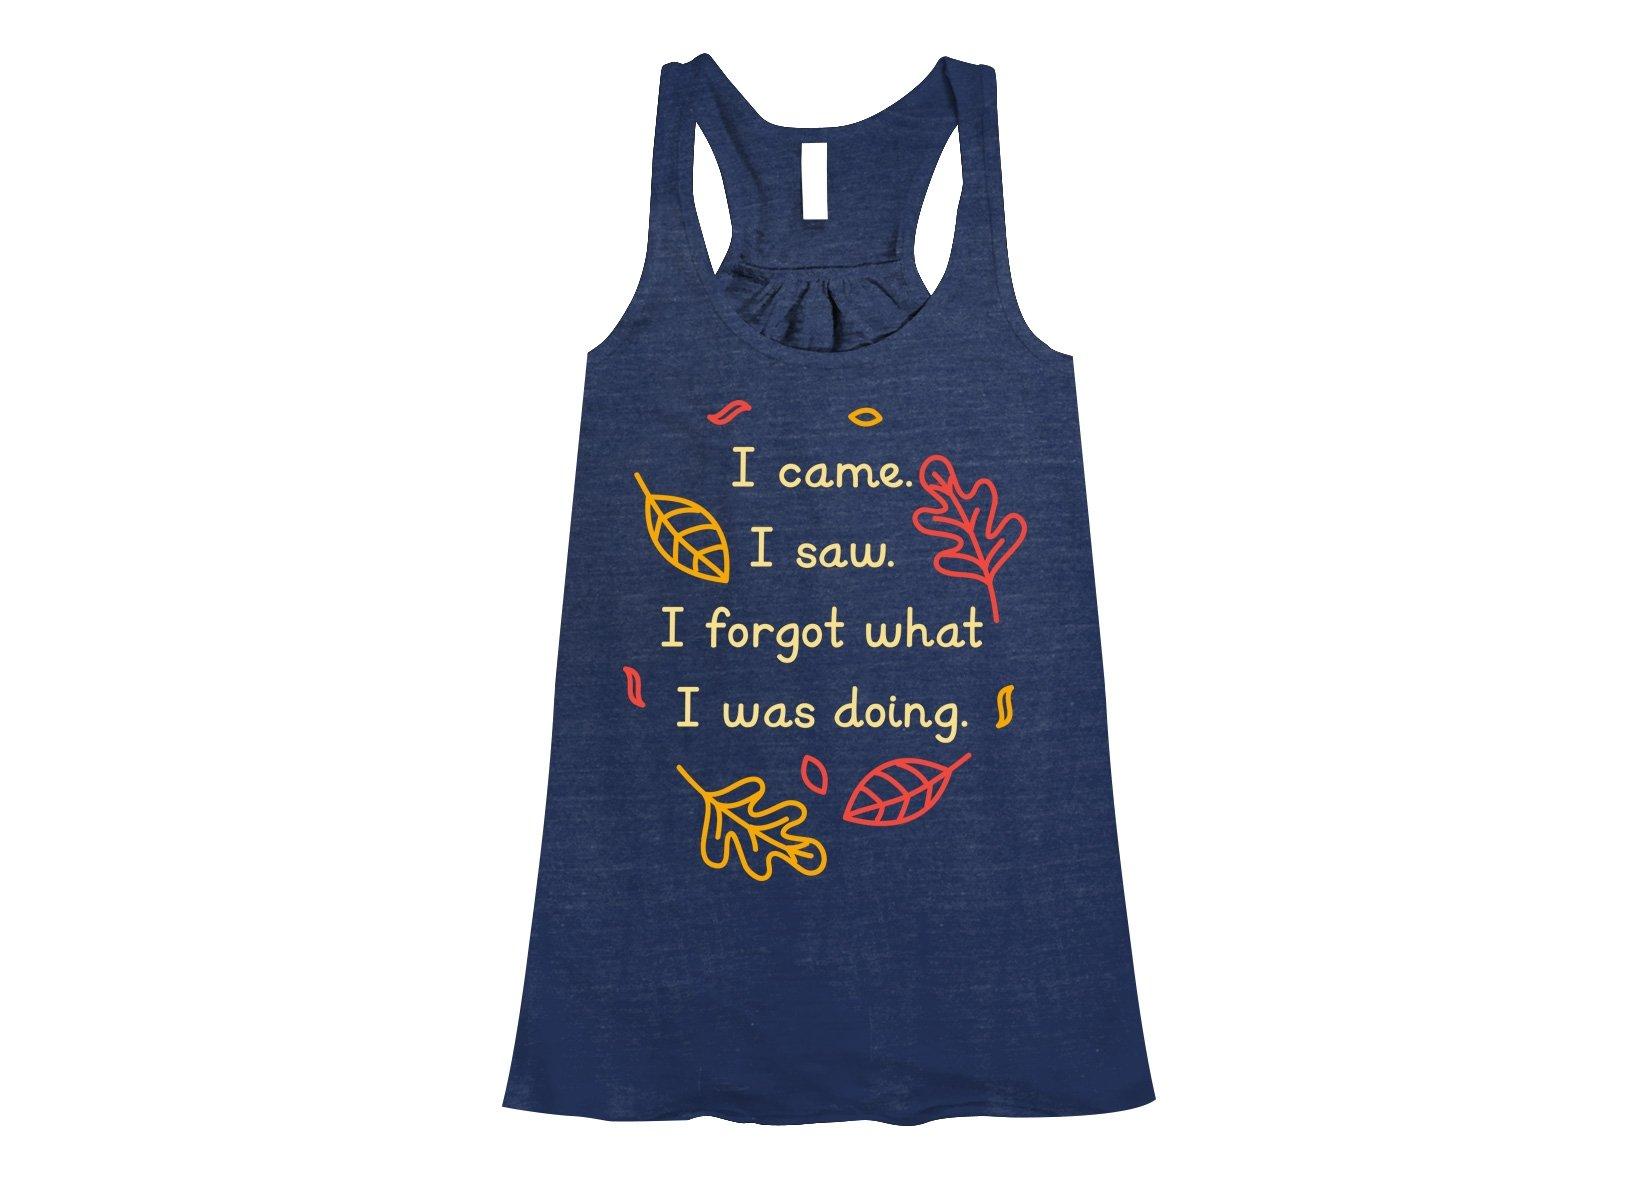 I Came. I Saw. I Forgot What I Was Doing. on Womens Tanks T-Shirt